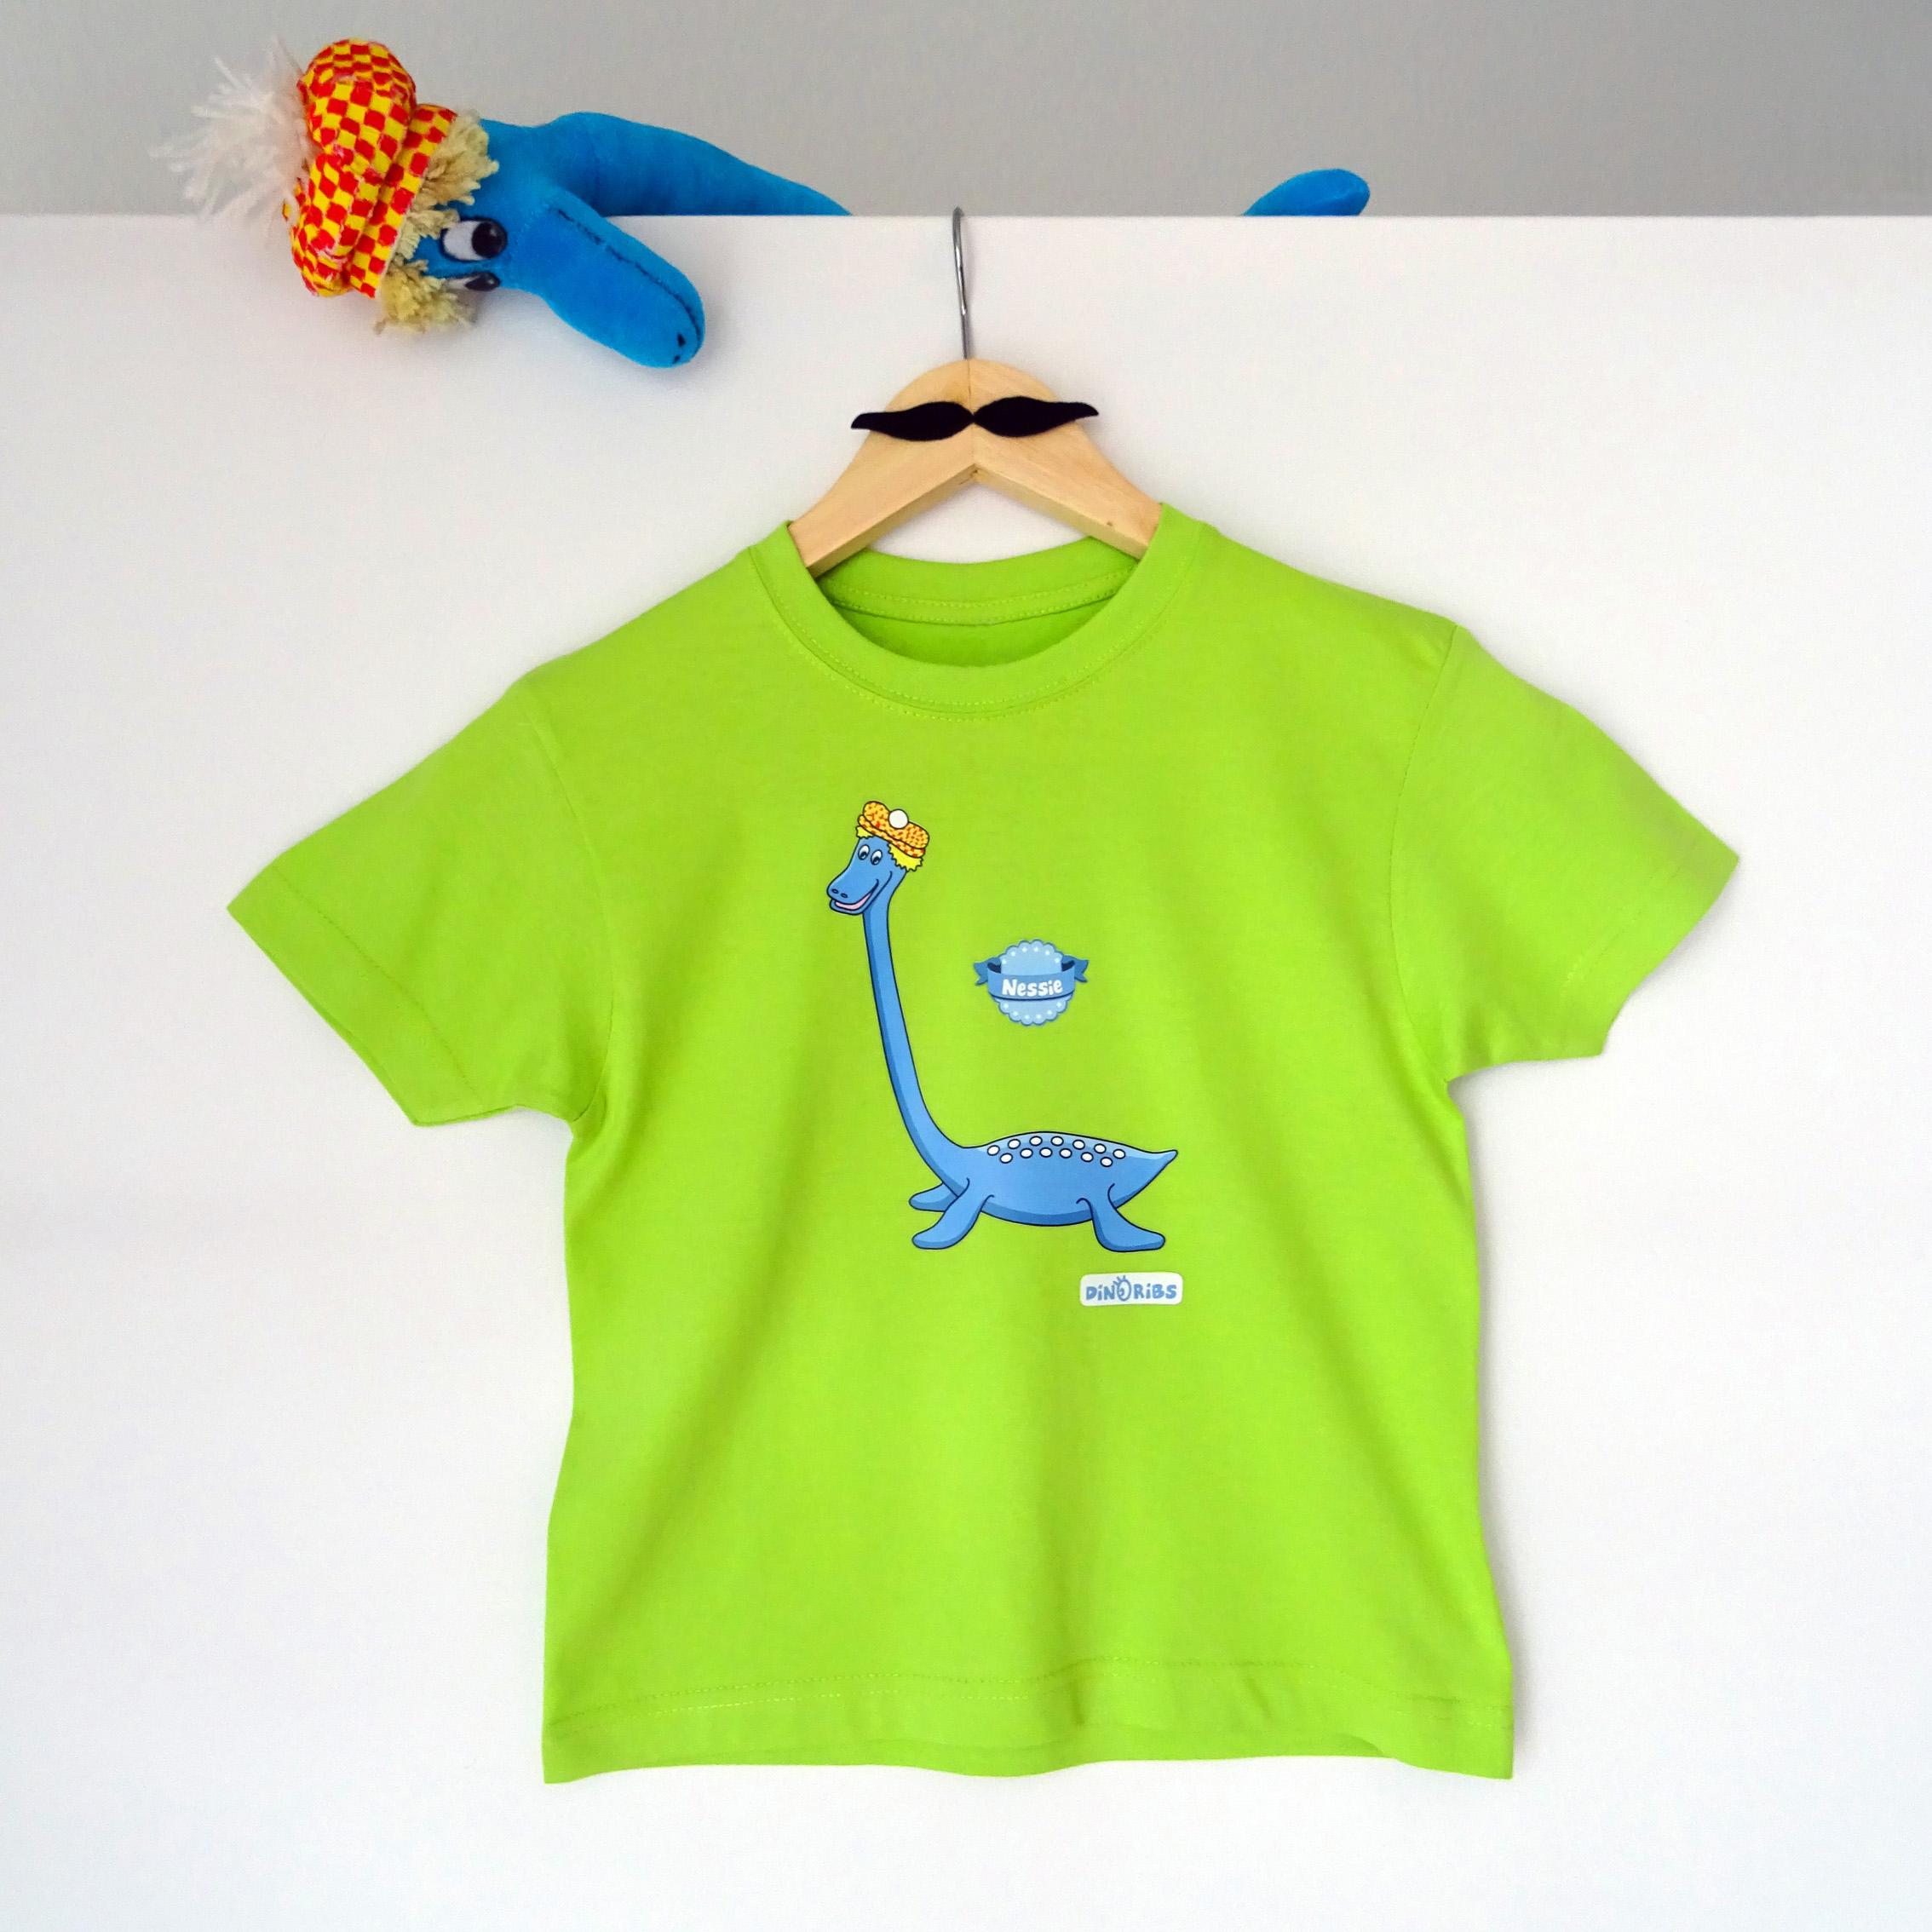 tshirt Nessie